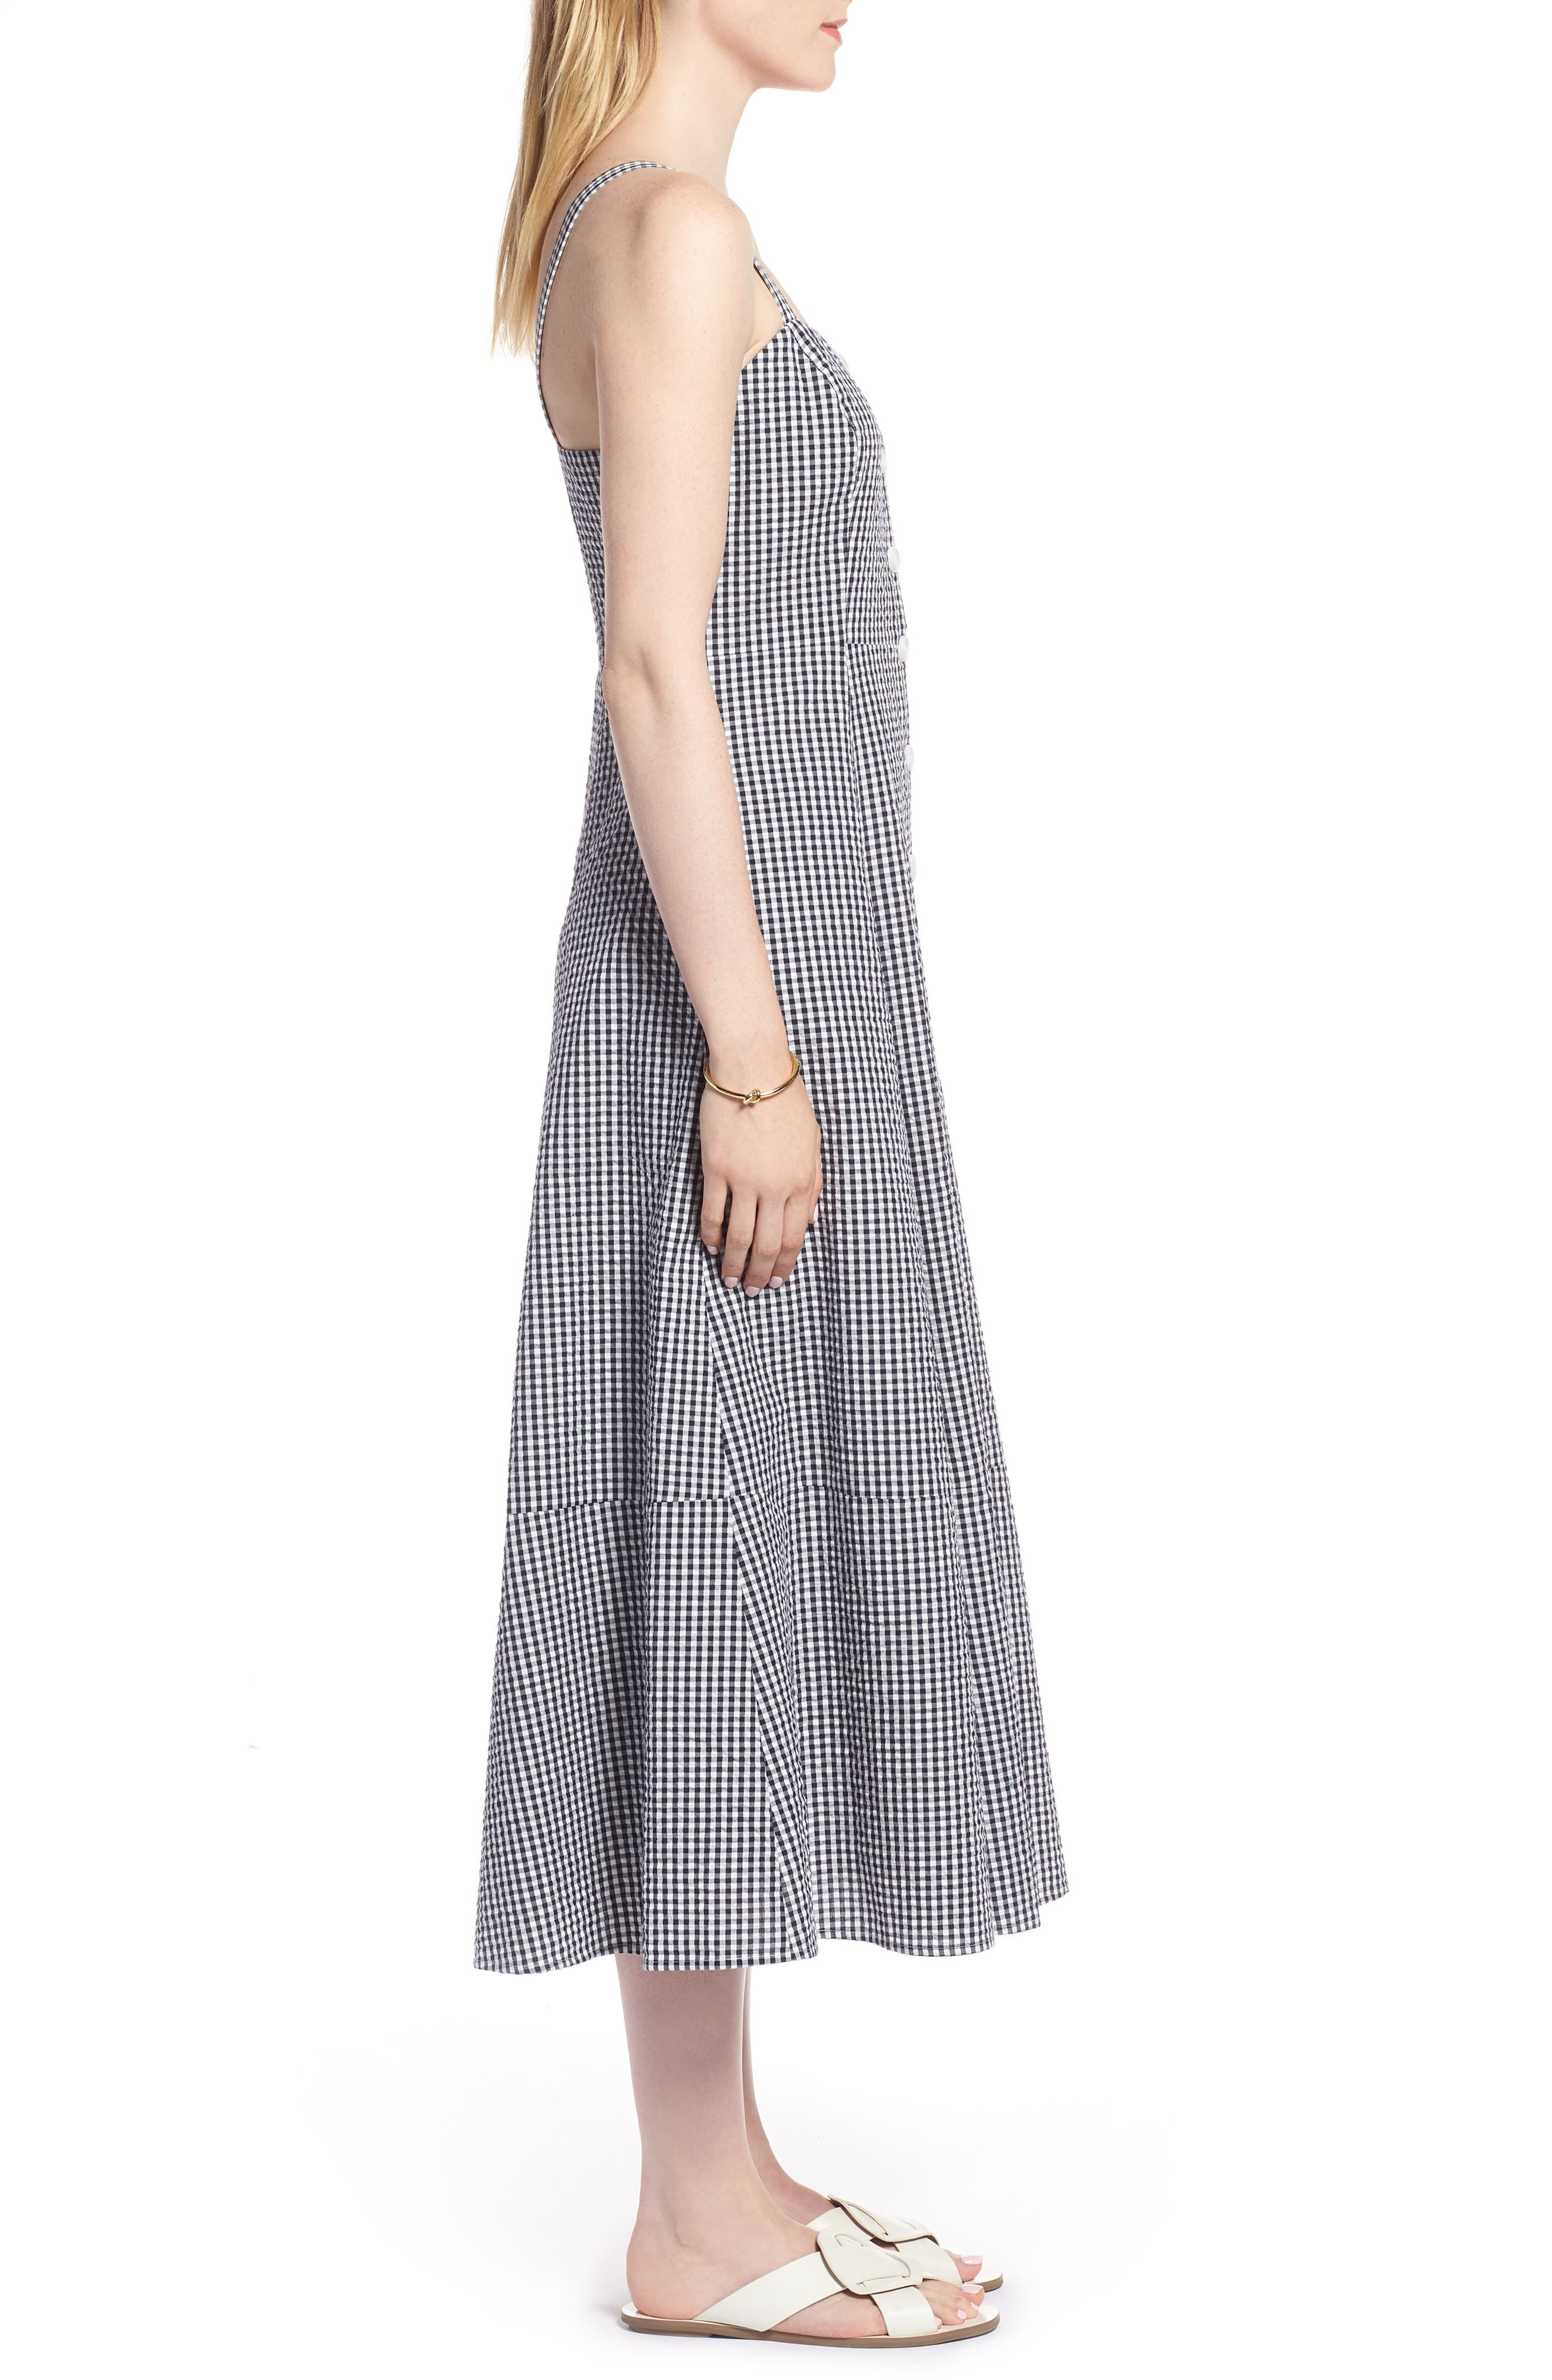 Gingham Button Front Cotton Blend Dress,                             Alternate thumbnail 3, color,                             Navy- White Gingham